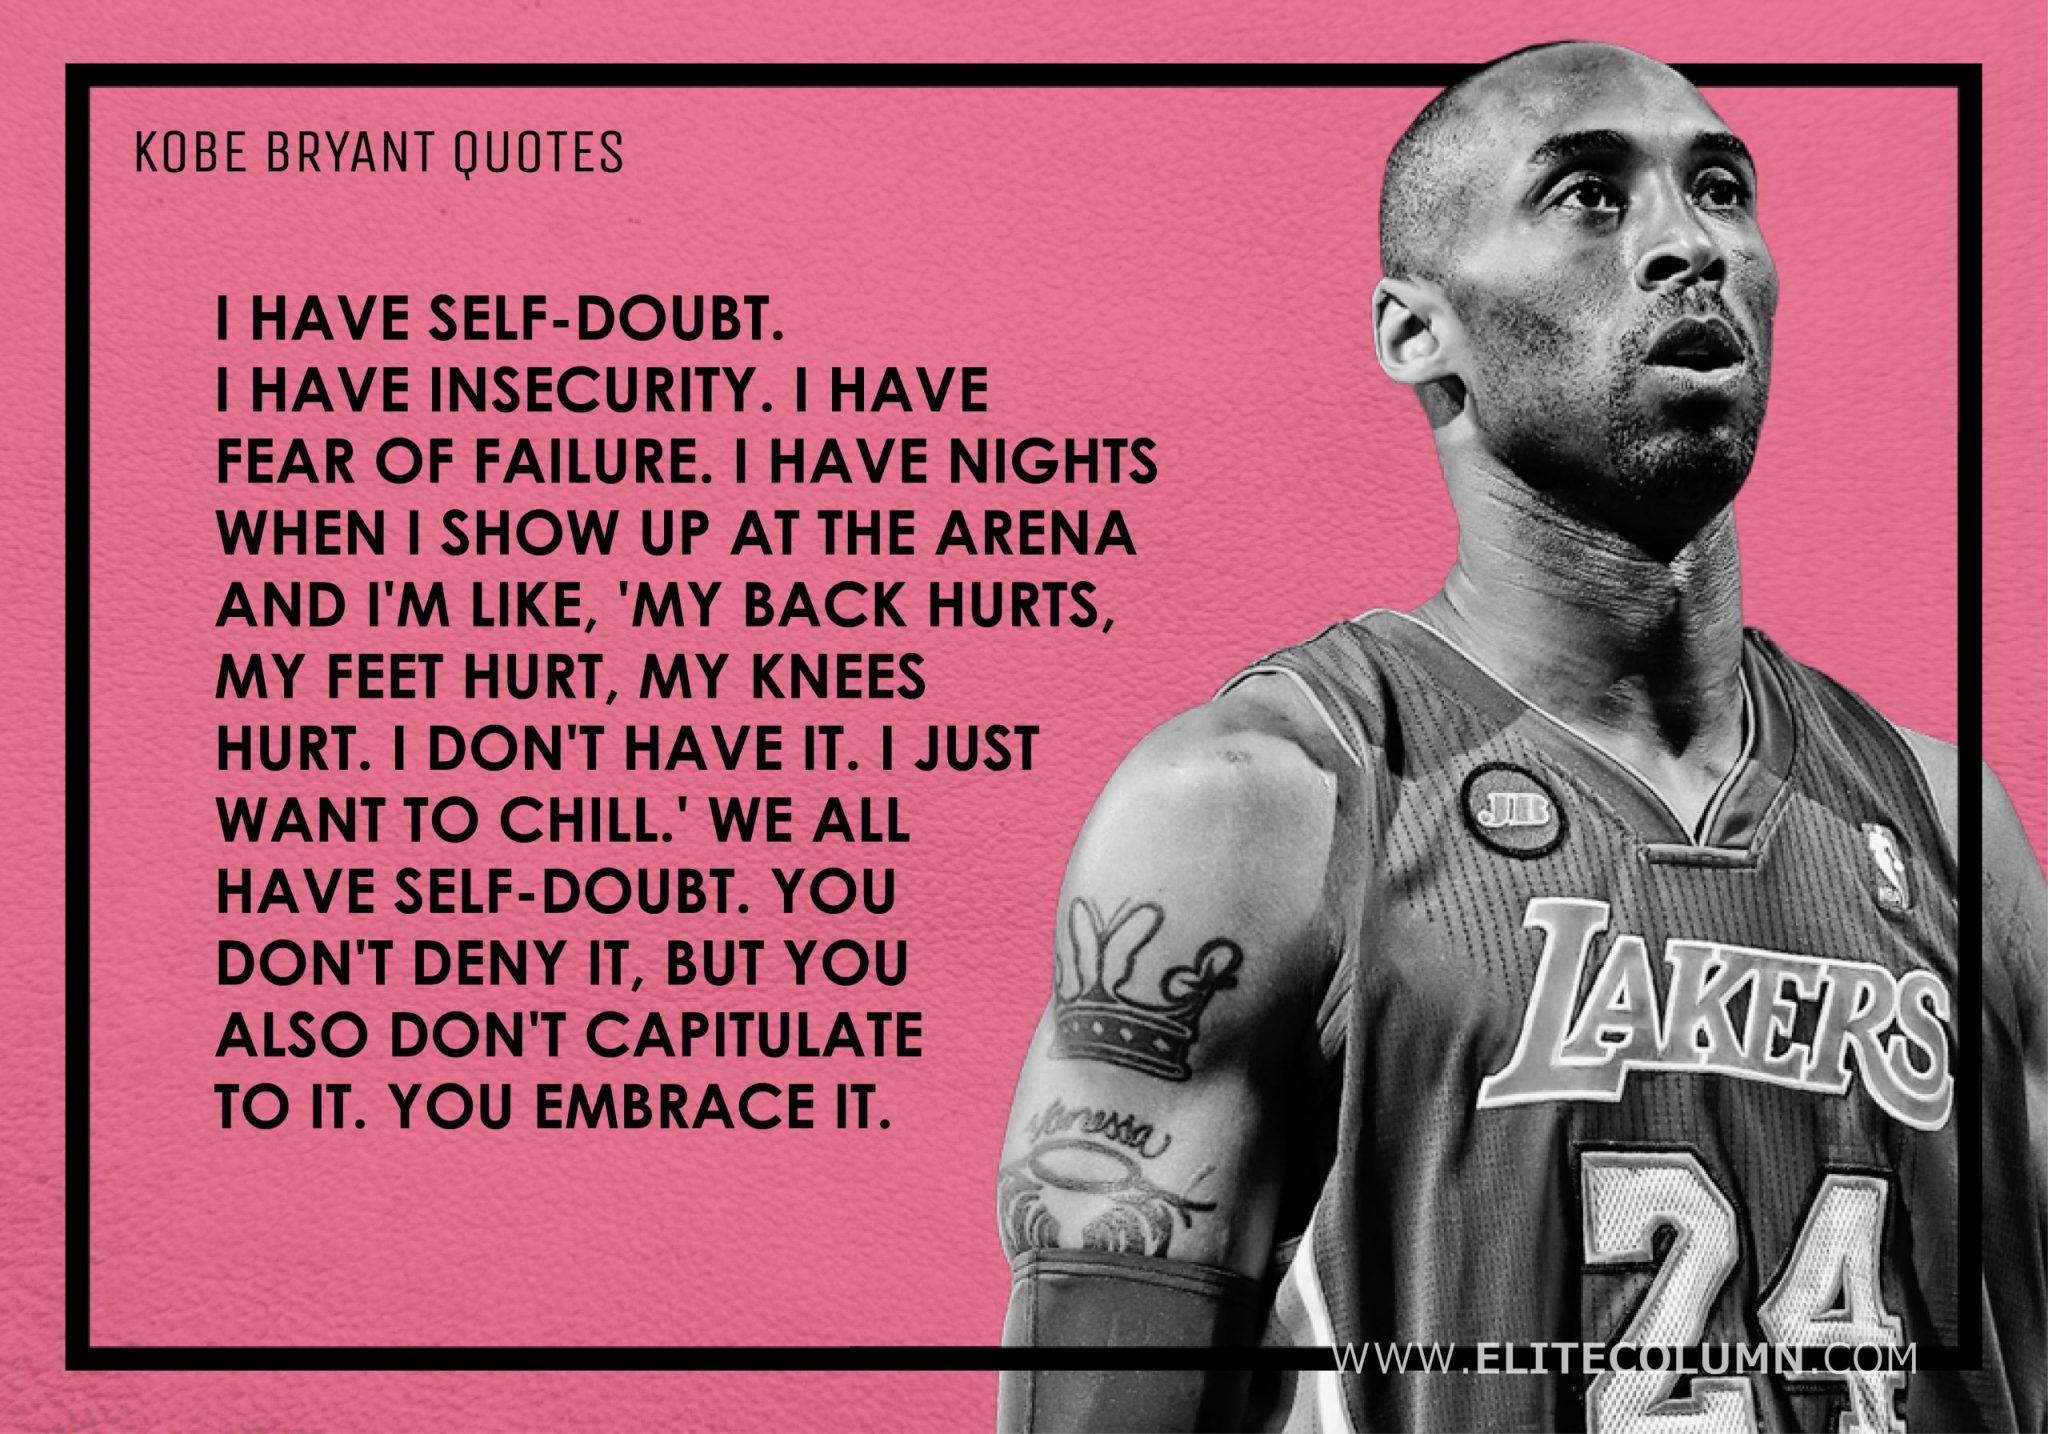 Kobe Bryant Quotes (1)